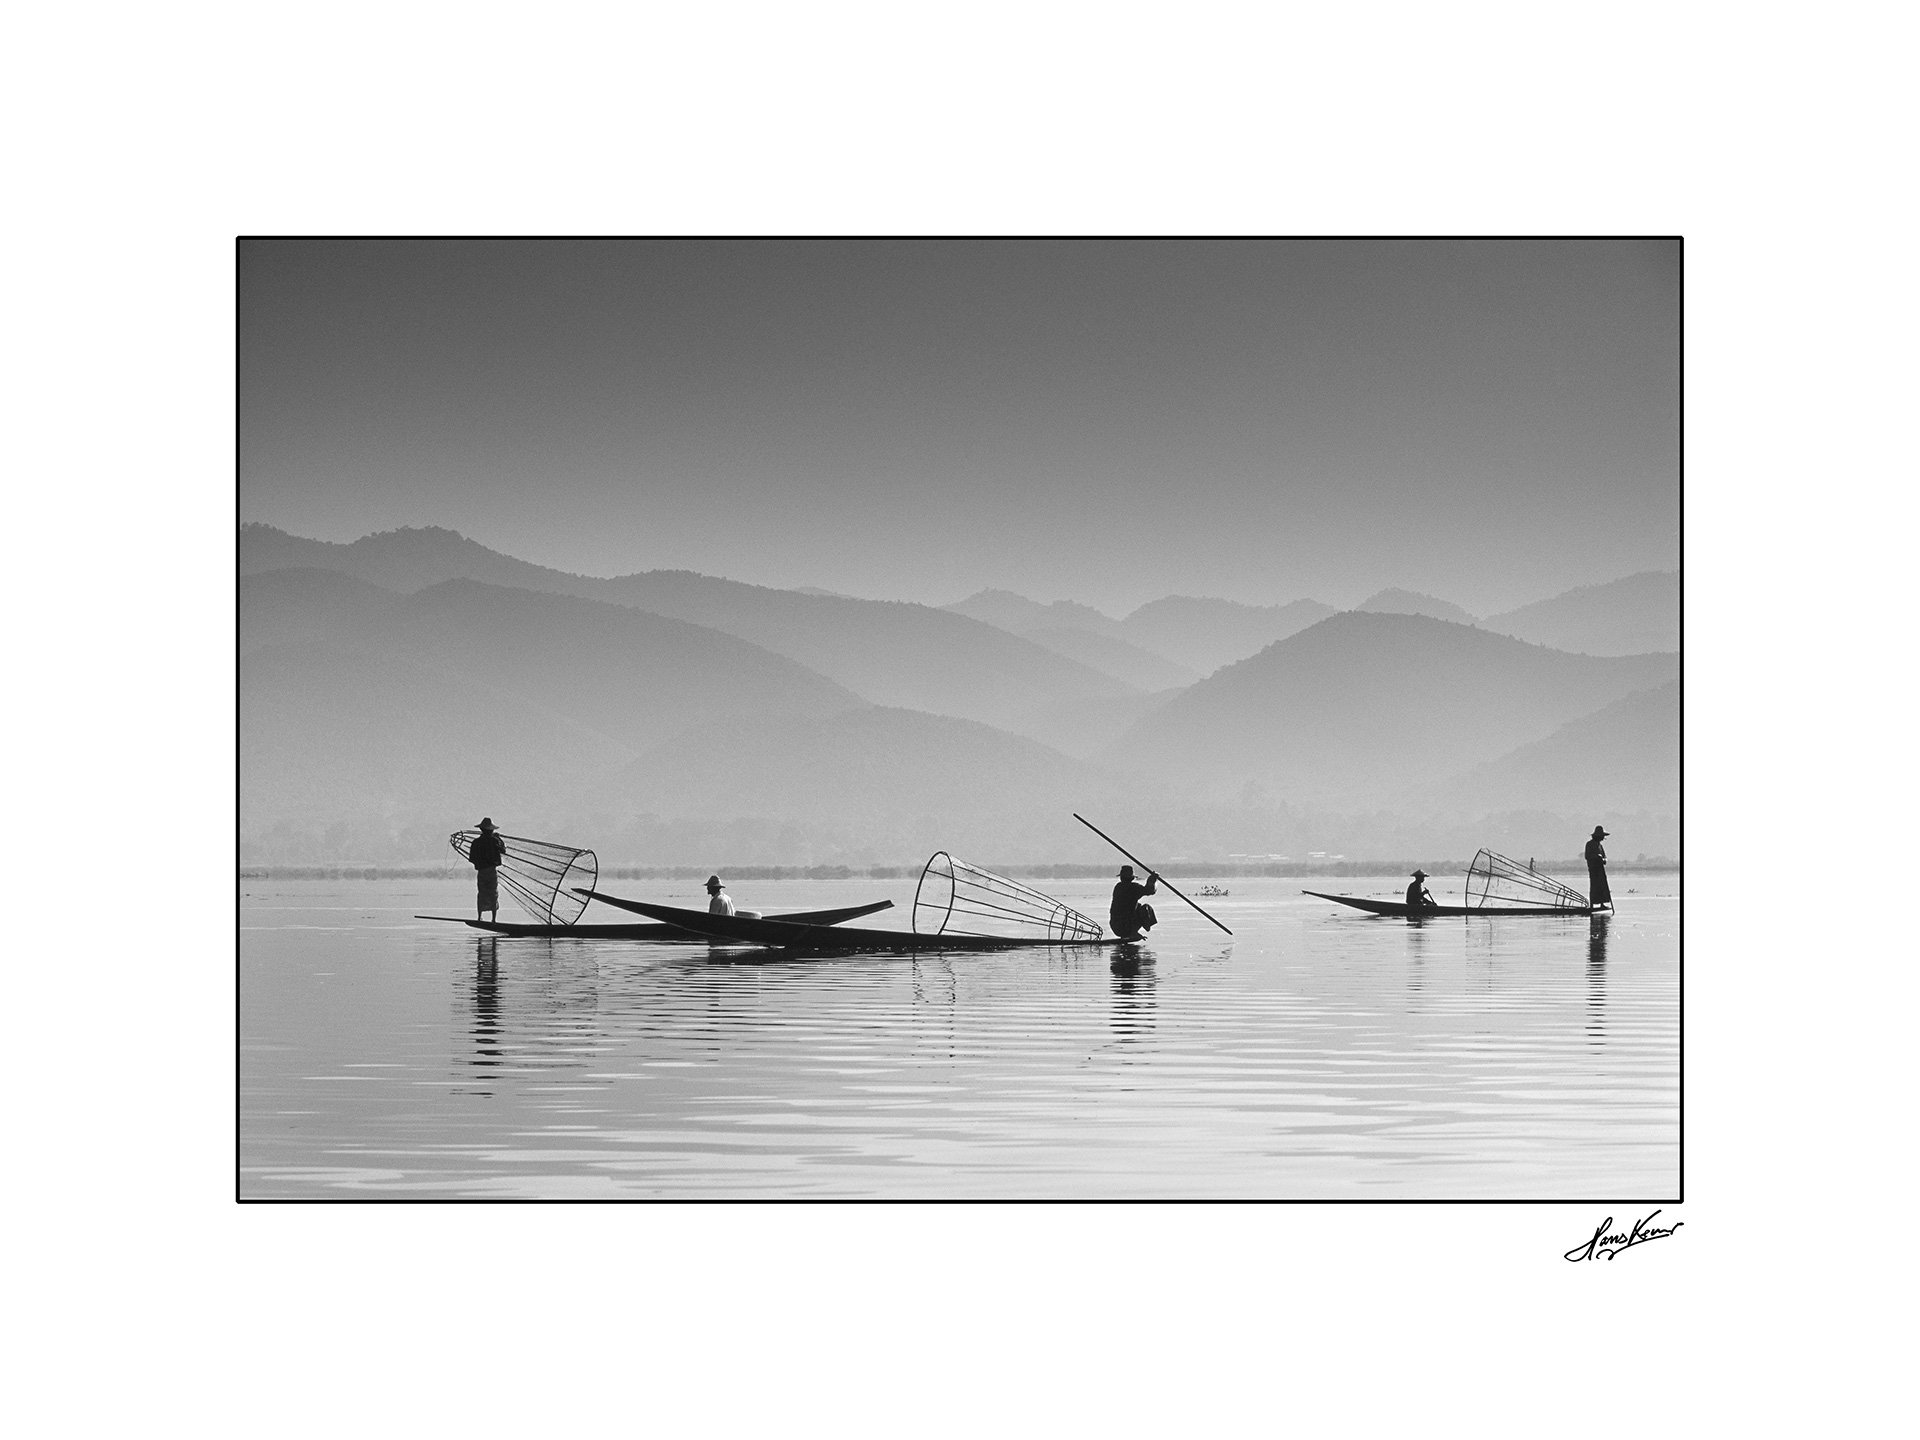 Inle Lake fishermen, Myanmar, 2001